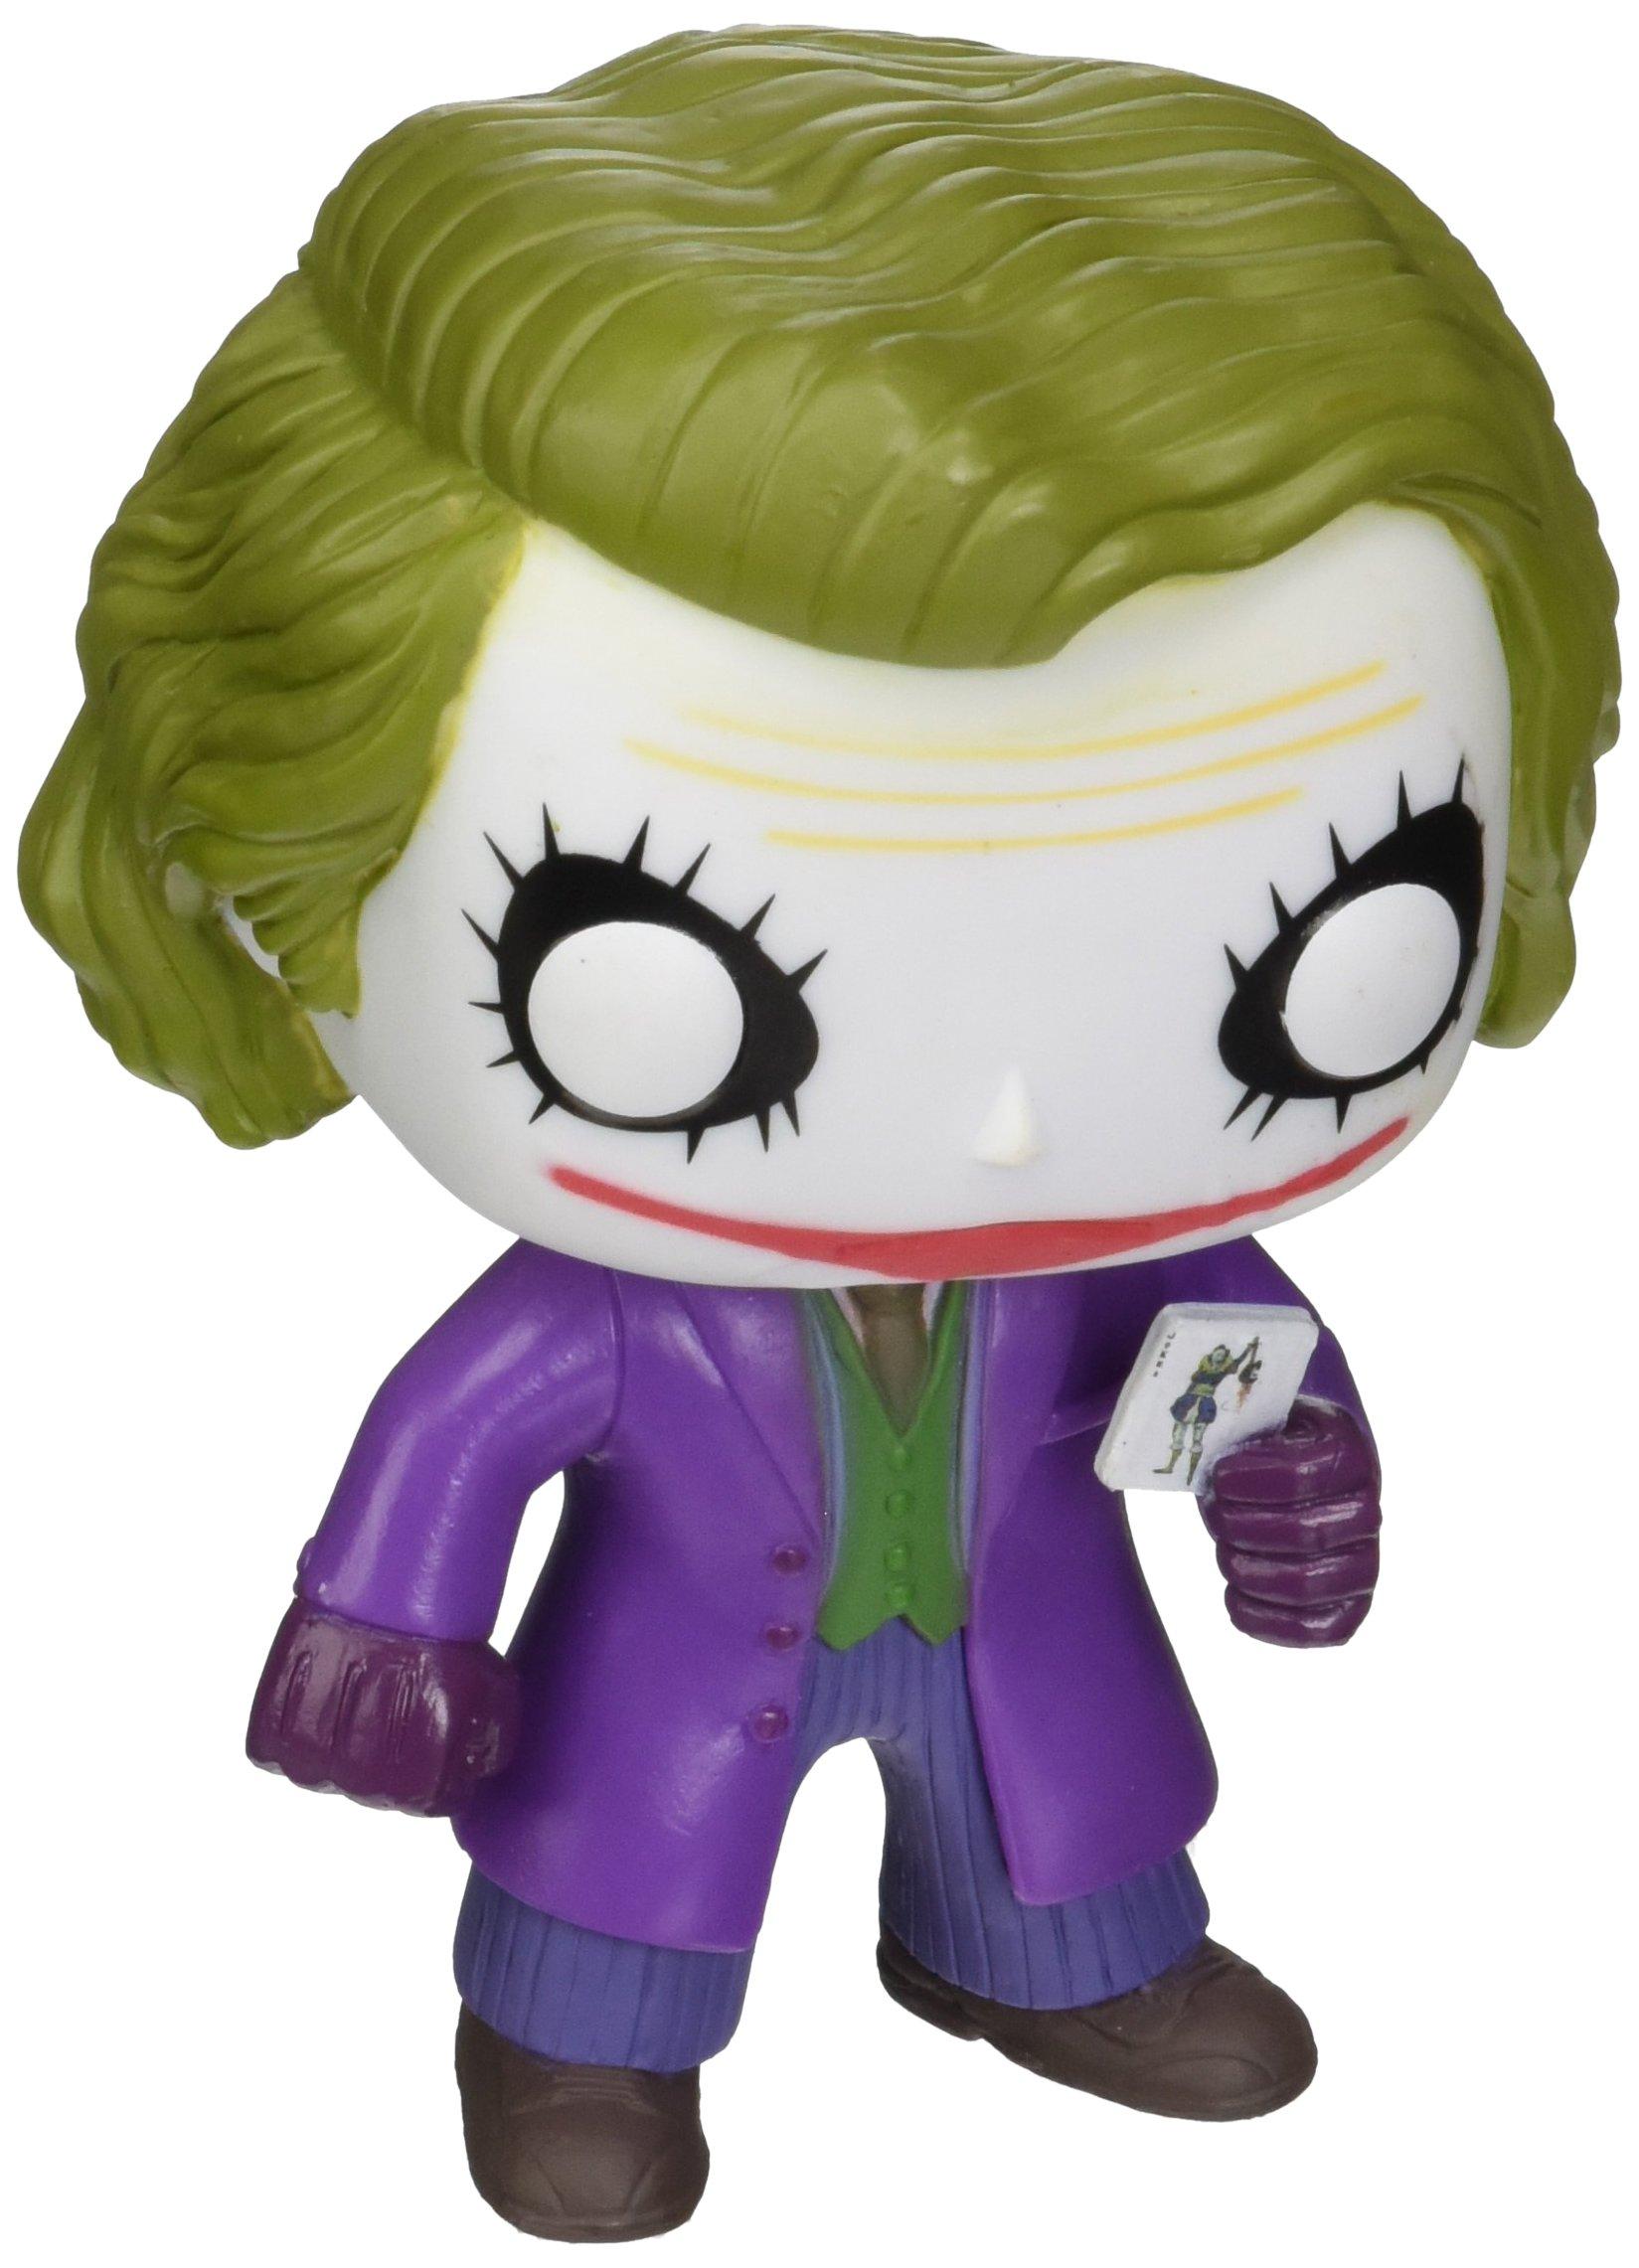 Funko POP Batman: Dark Knight Movie The Joker by Funko